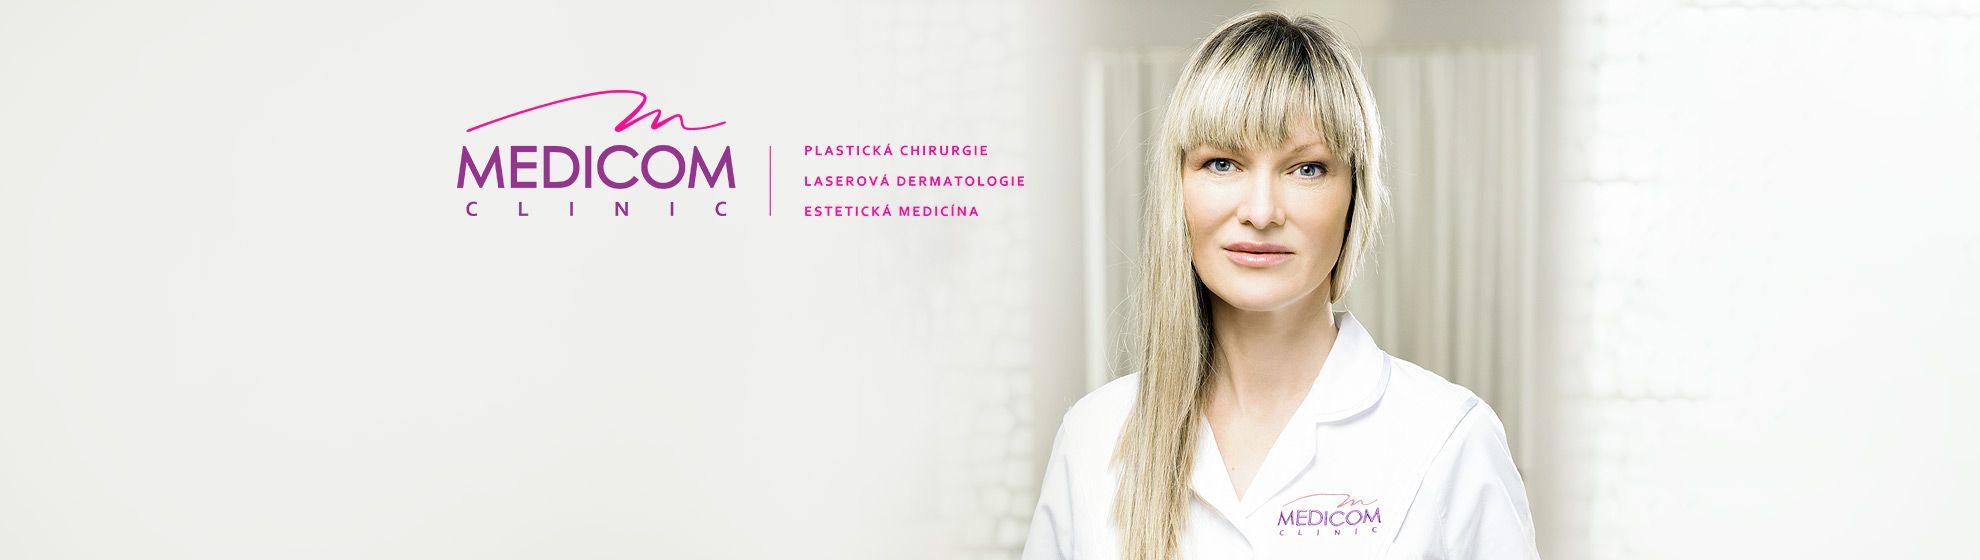 MUDr. Markéta Majerová - MEDICOM Clinic